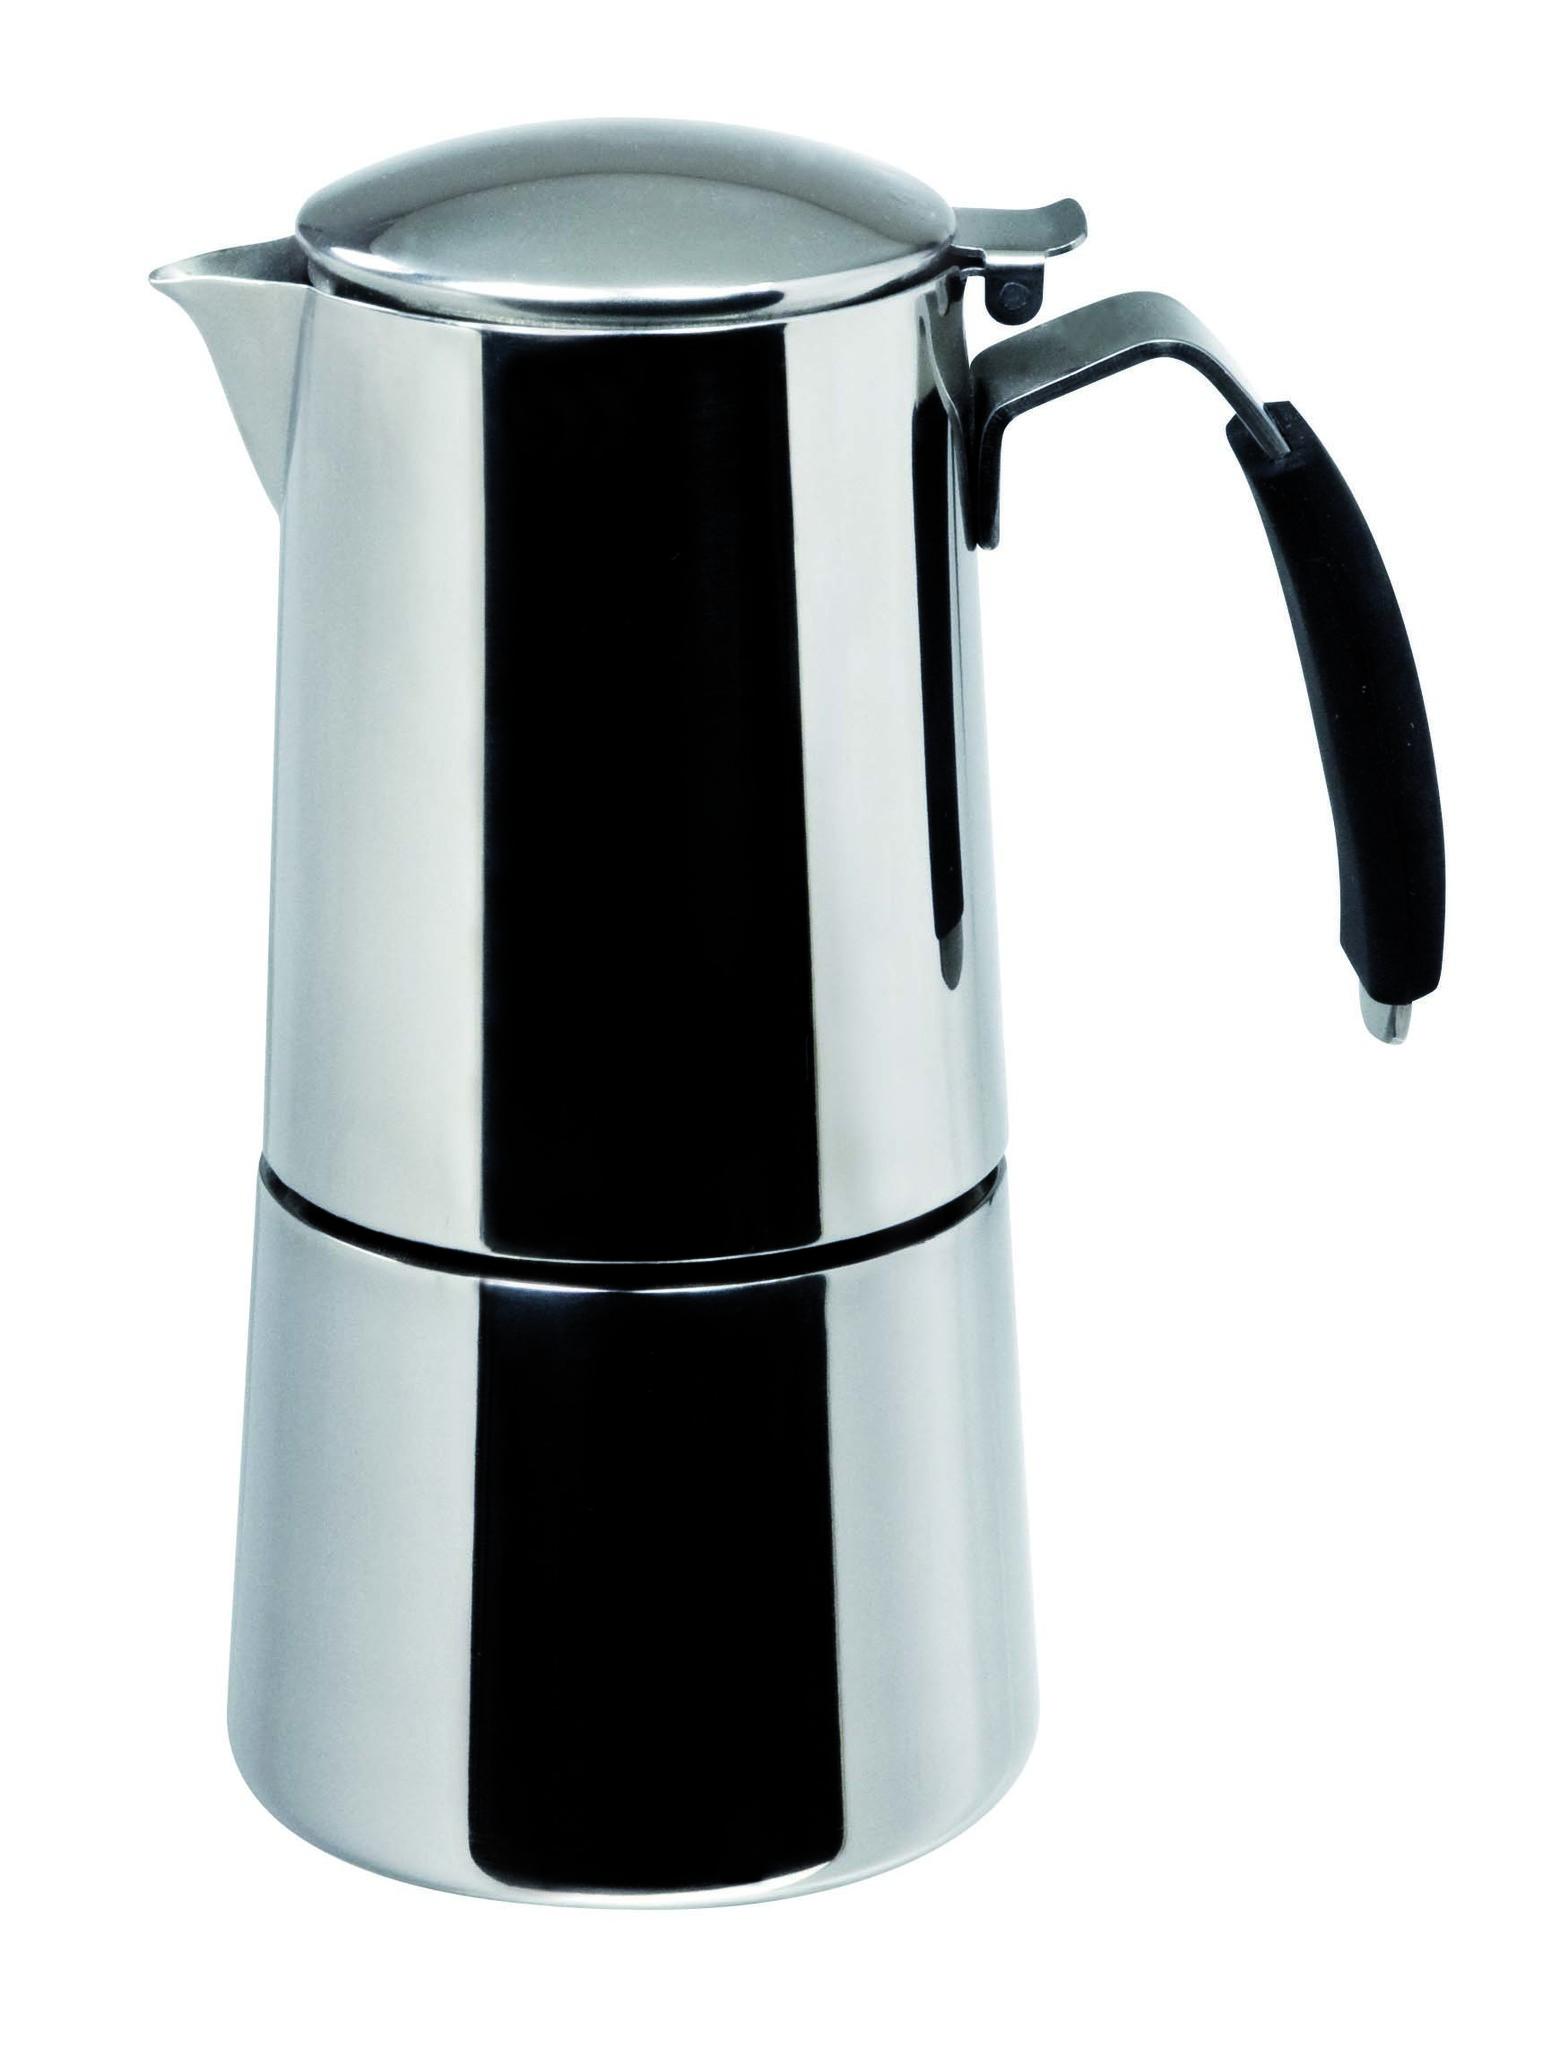 "ILSA Espressokocher ""Omnia"" aus Edelstahl 25cl / 4 Tassen"